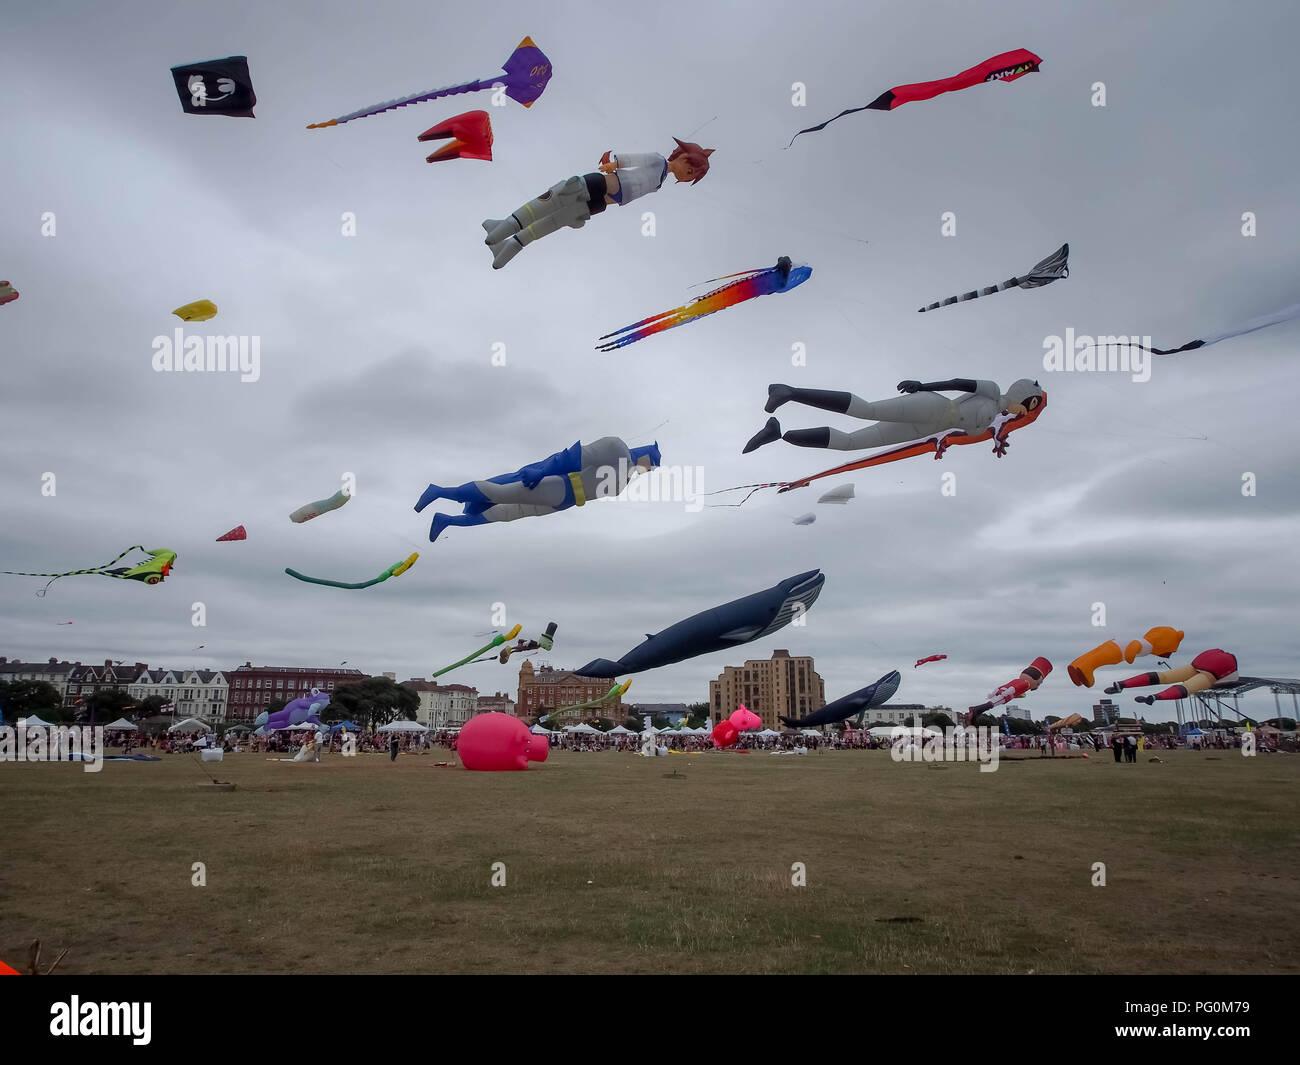 Kites flying at Portsmouth international kite festival Stock Photo